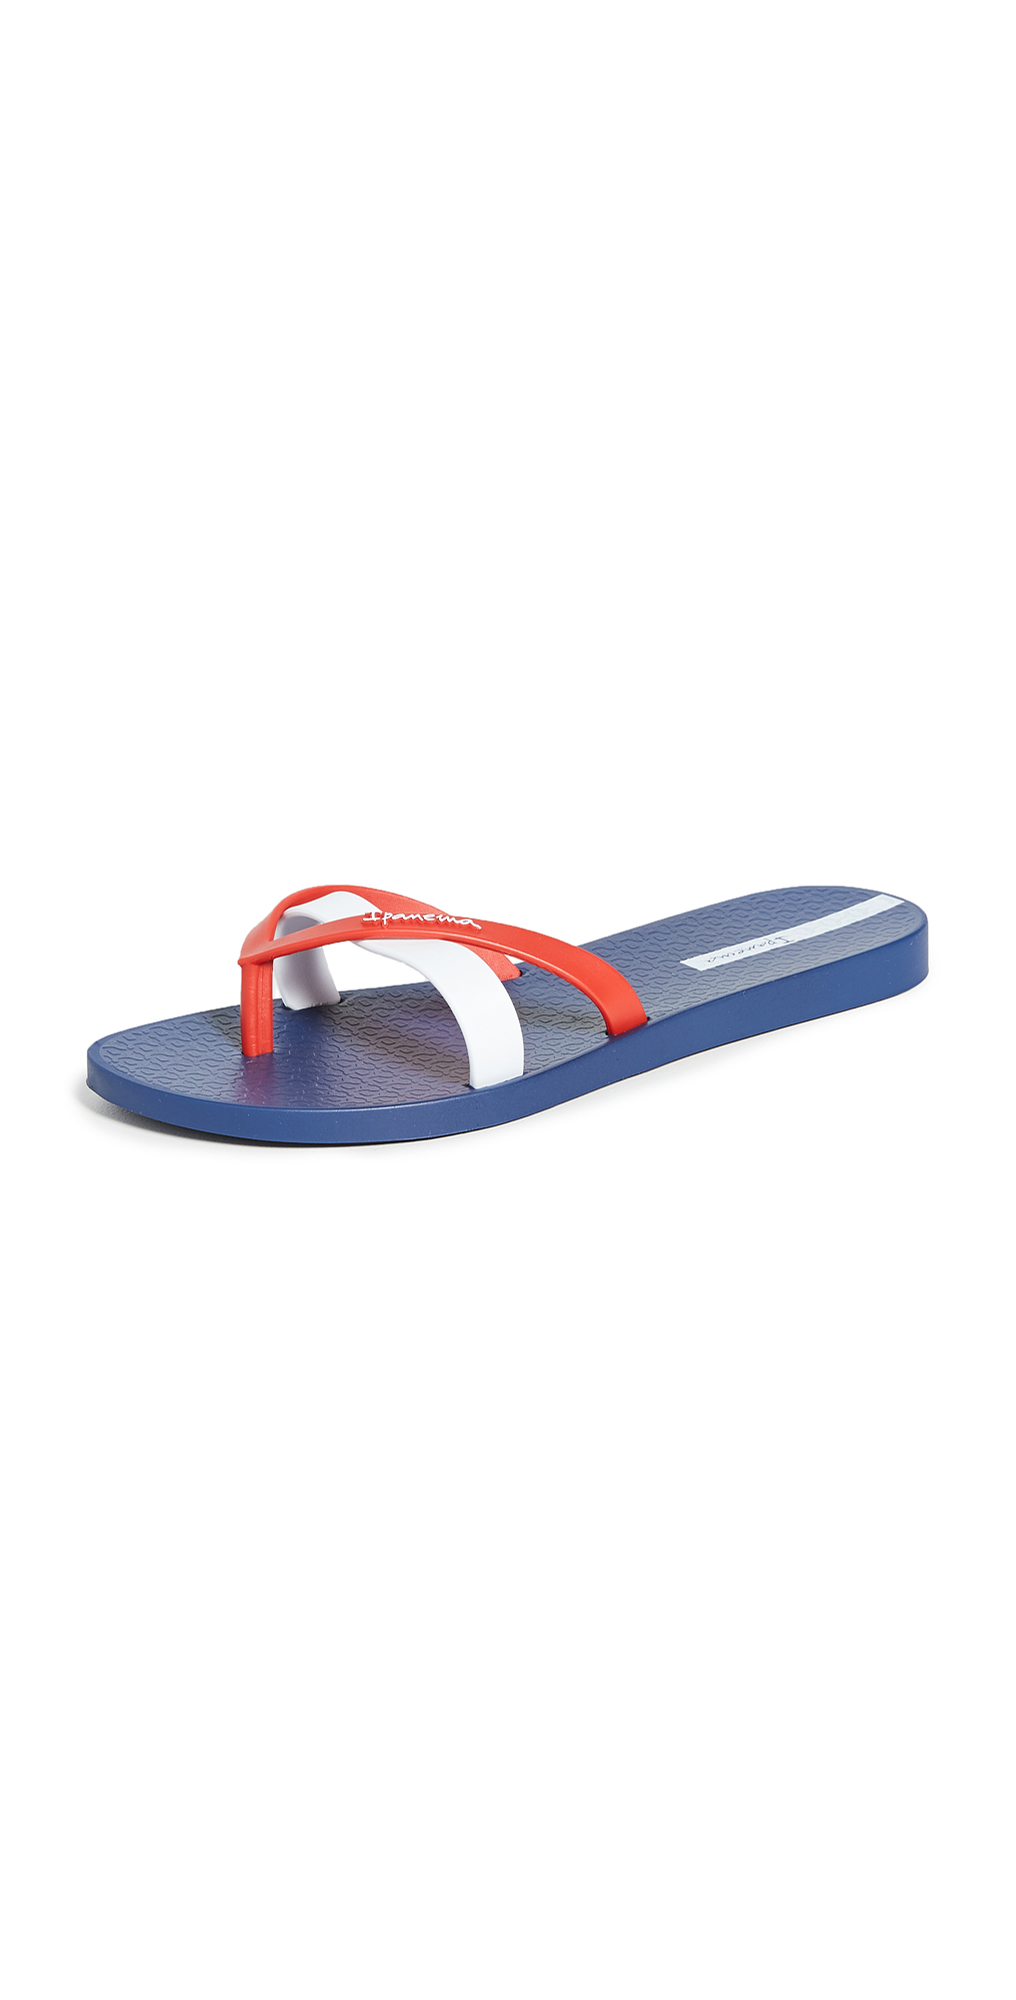 Kirei Flip Flops